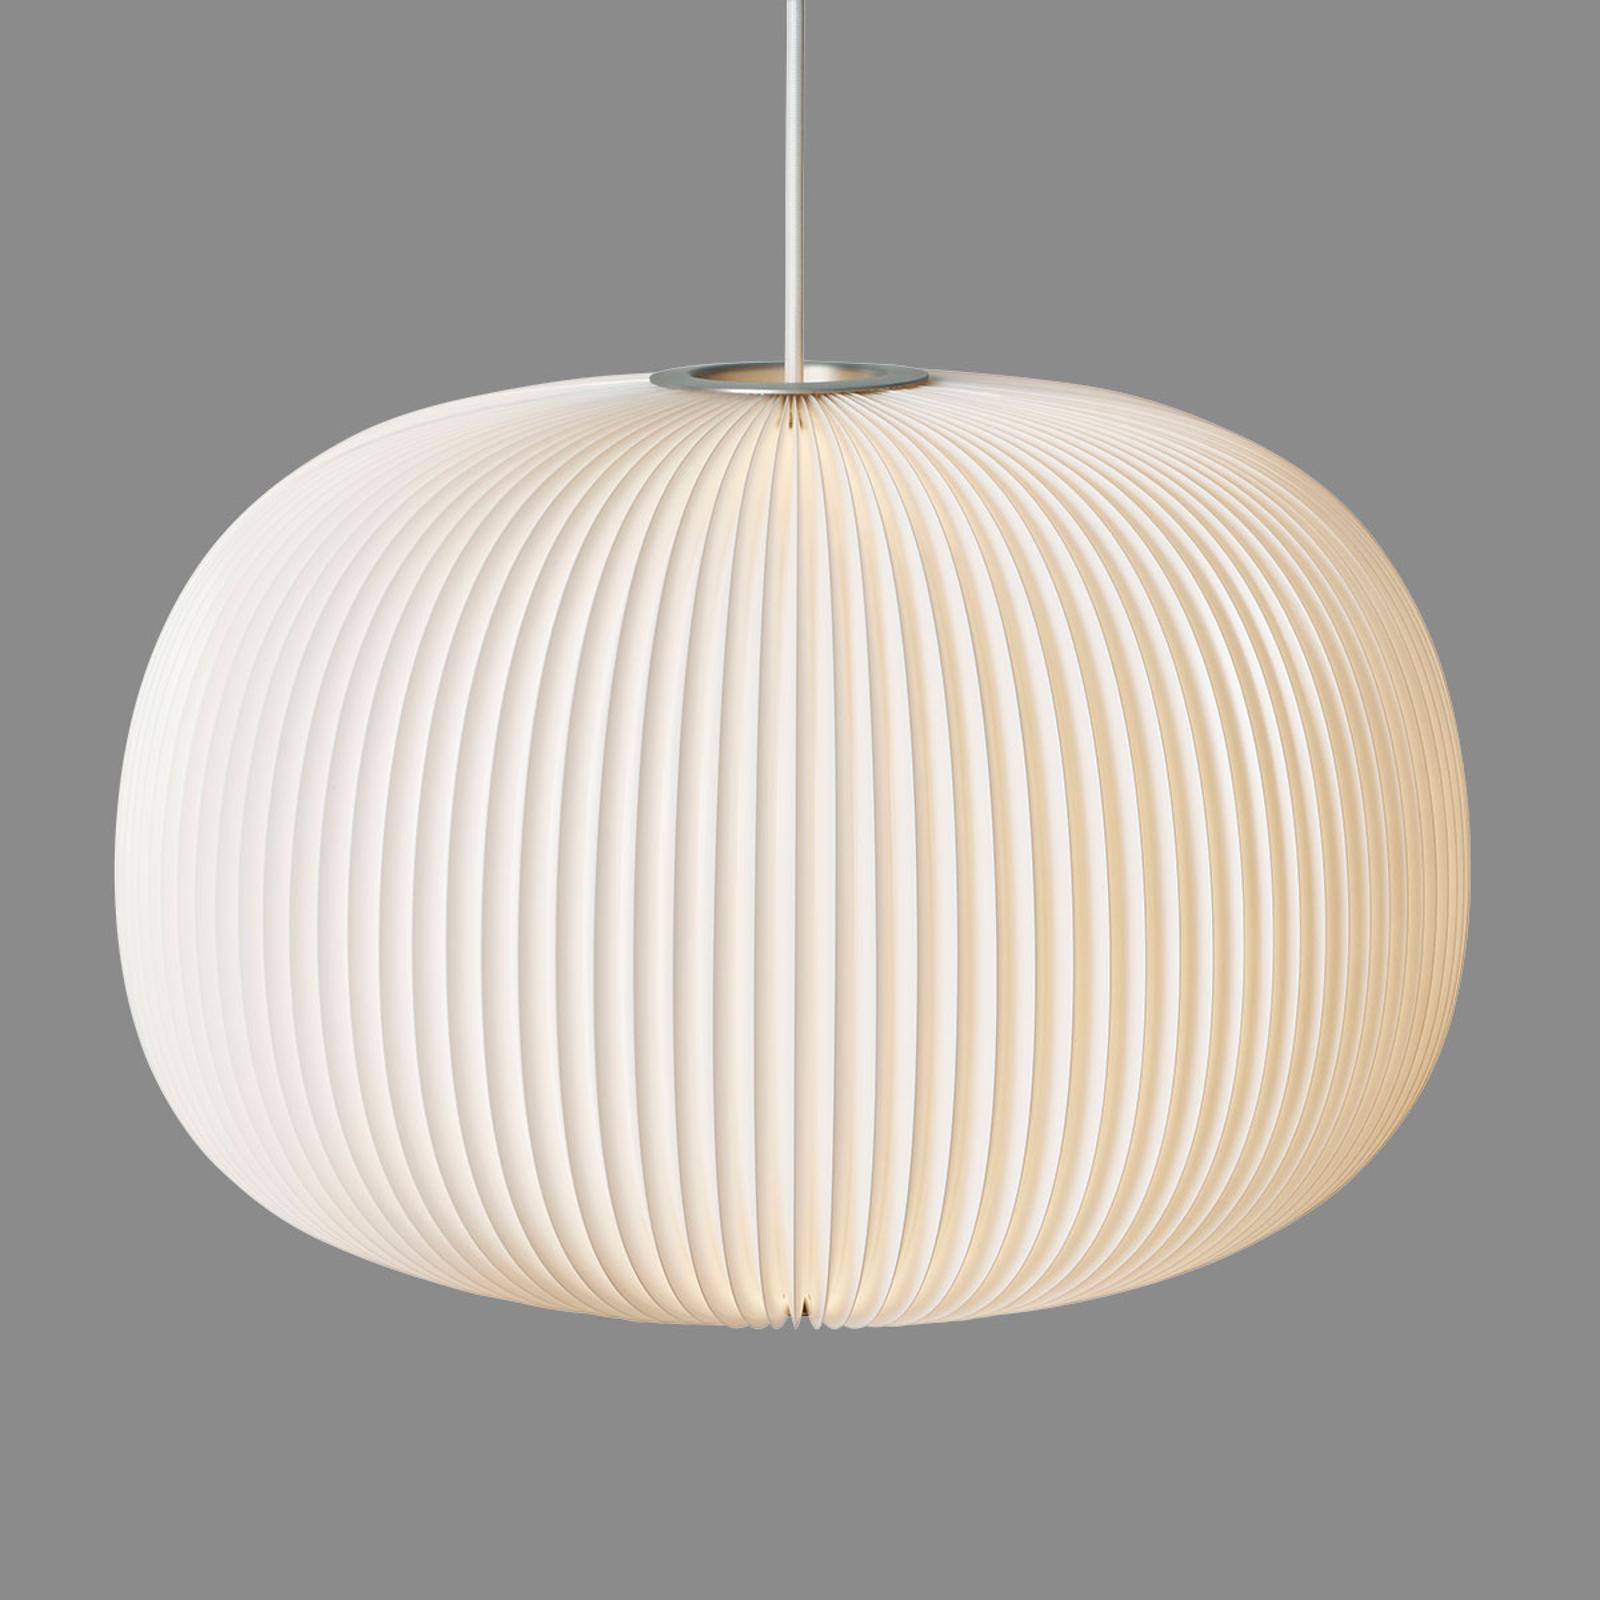 LE KLINT Lamella 1 designer hengelampe | Lampegiganten.no